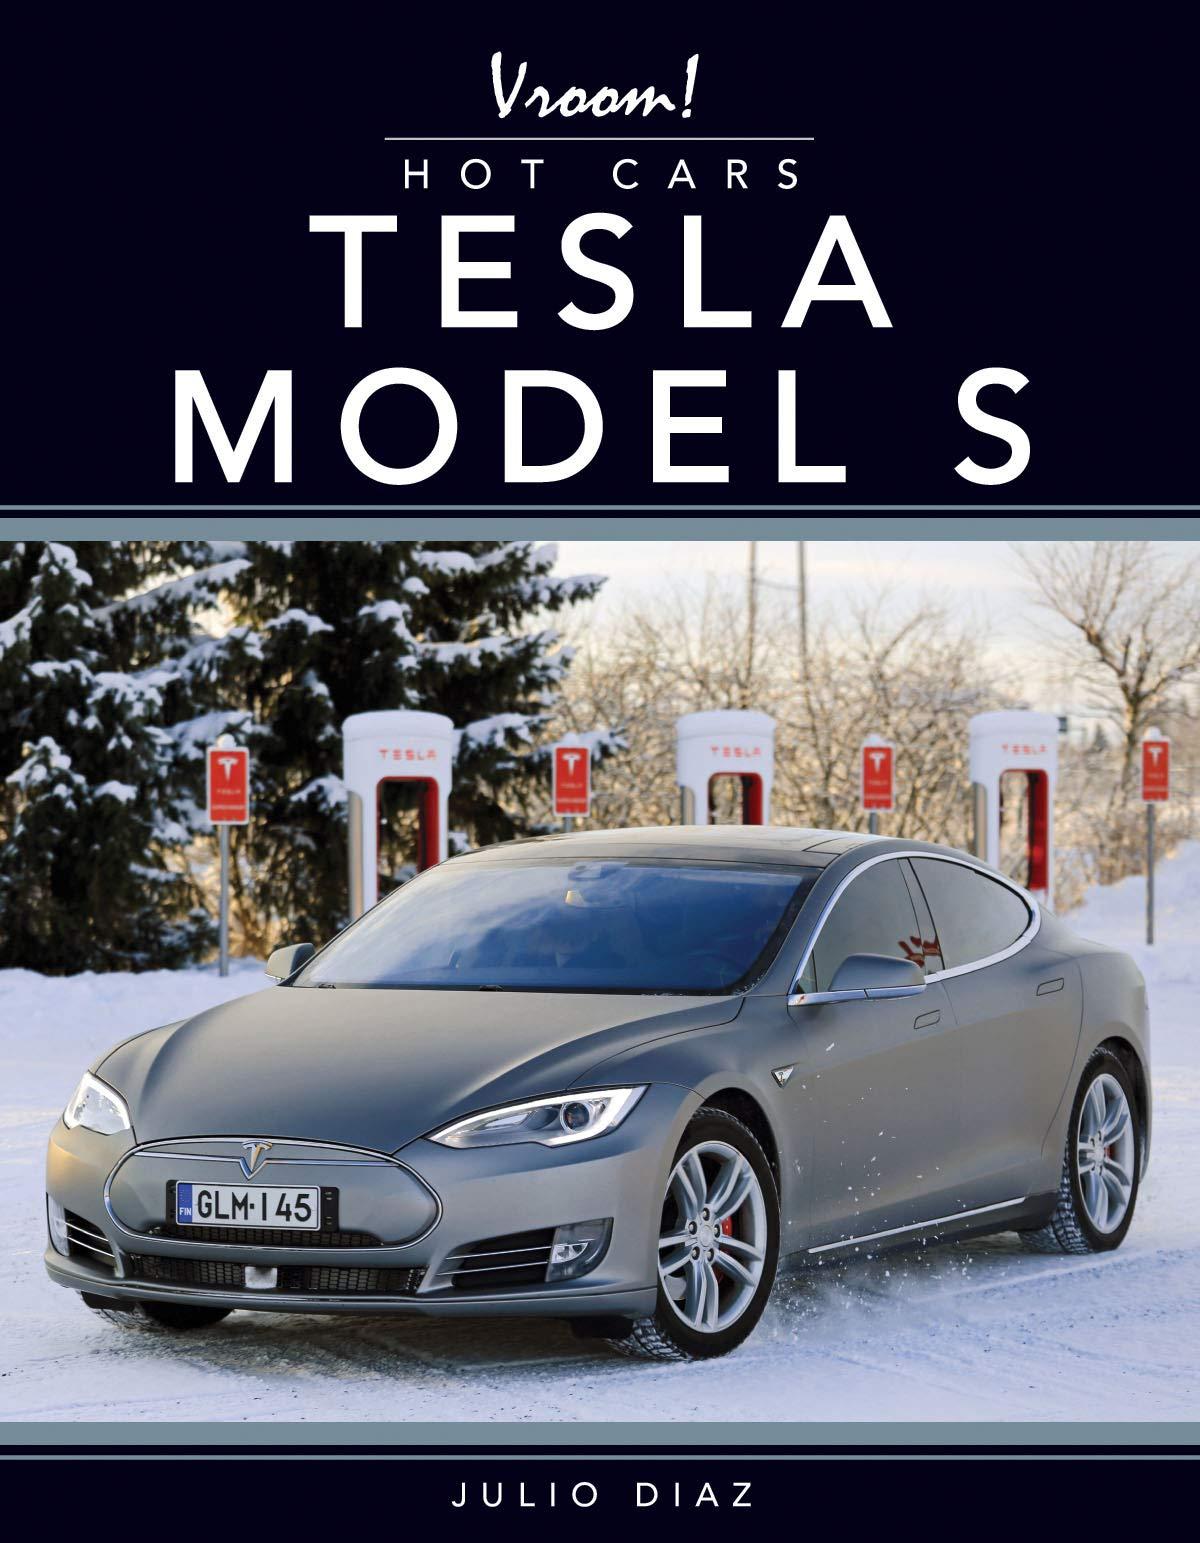 Tesla Model S (Vroom! Hot Cars) Library Binding – August 1, 2016 Julio Diaz Rourke Educational Media 1681917491 Automobiles